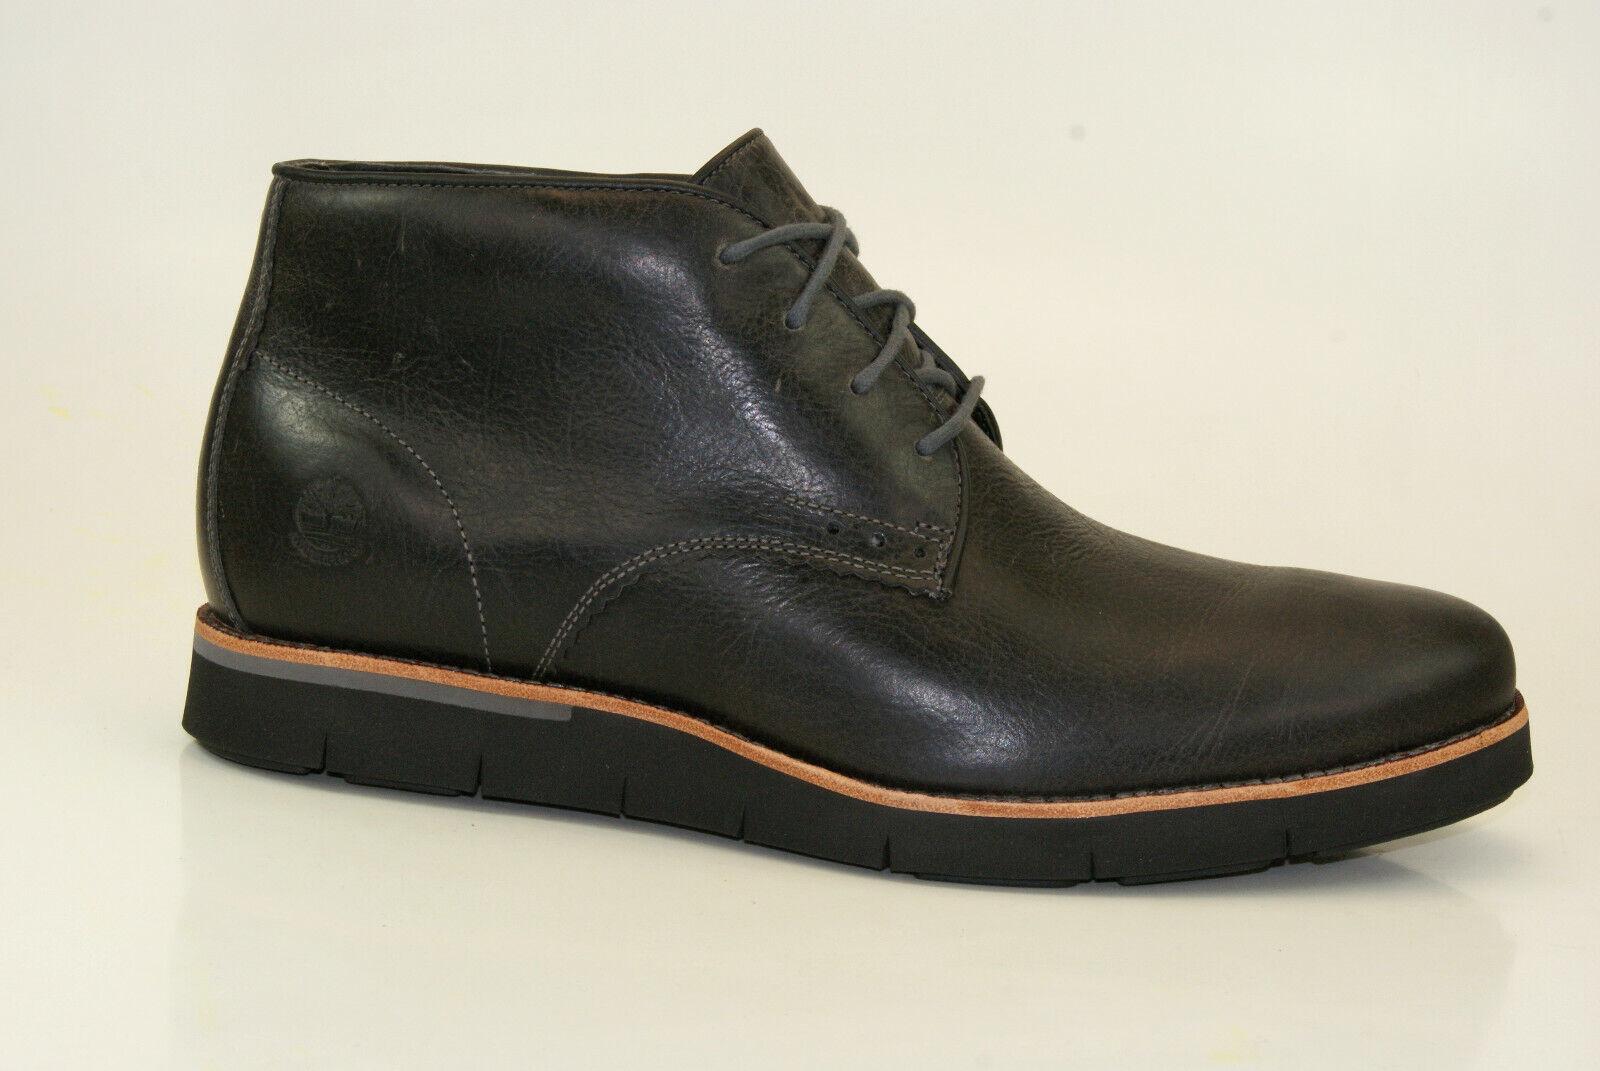 Timberland Preston Hill Chukka Boots Waterproof Herren Schuhe SensorFlex A1MND